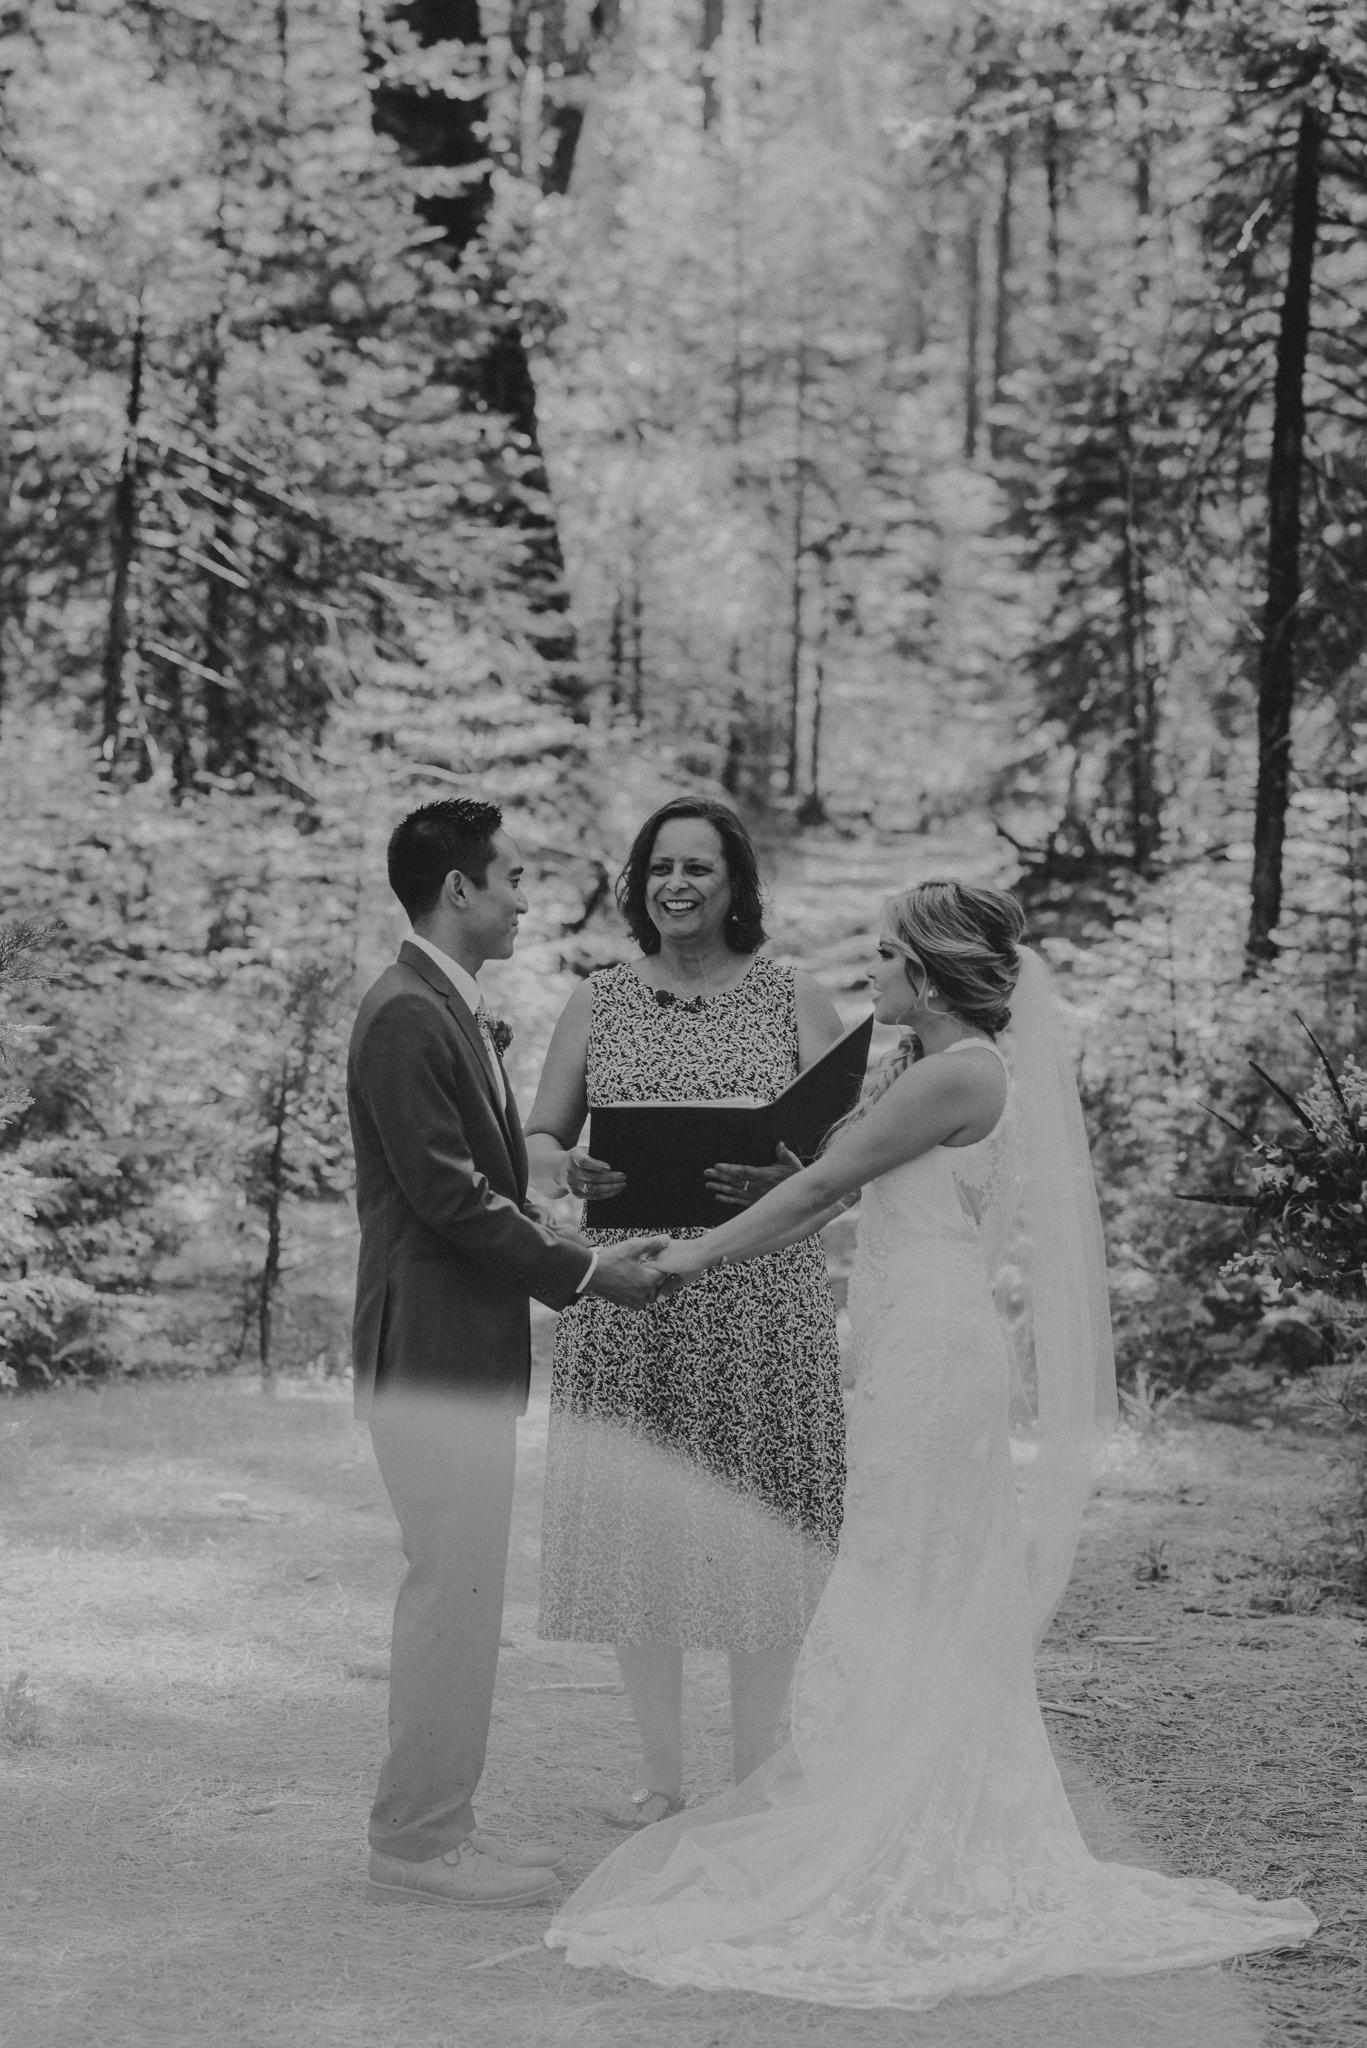 © Isaiah + Taylor Photography - Evergreen Lodge Destination Yoesmite Wedding - Los Angeles Wedding Photographer-109.jpg